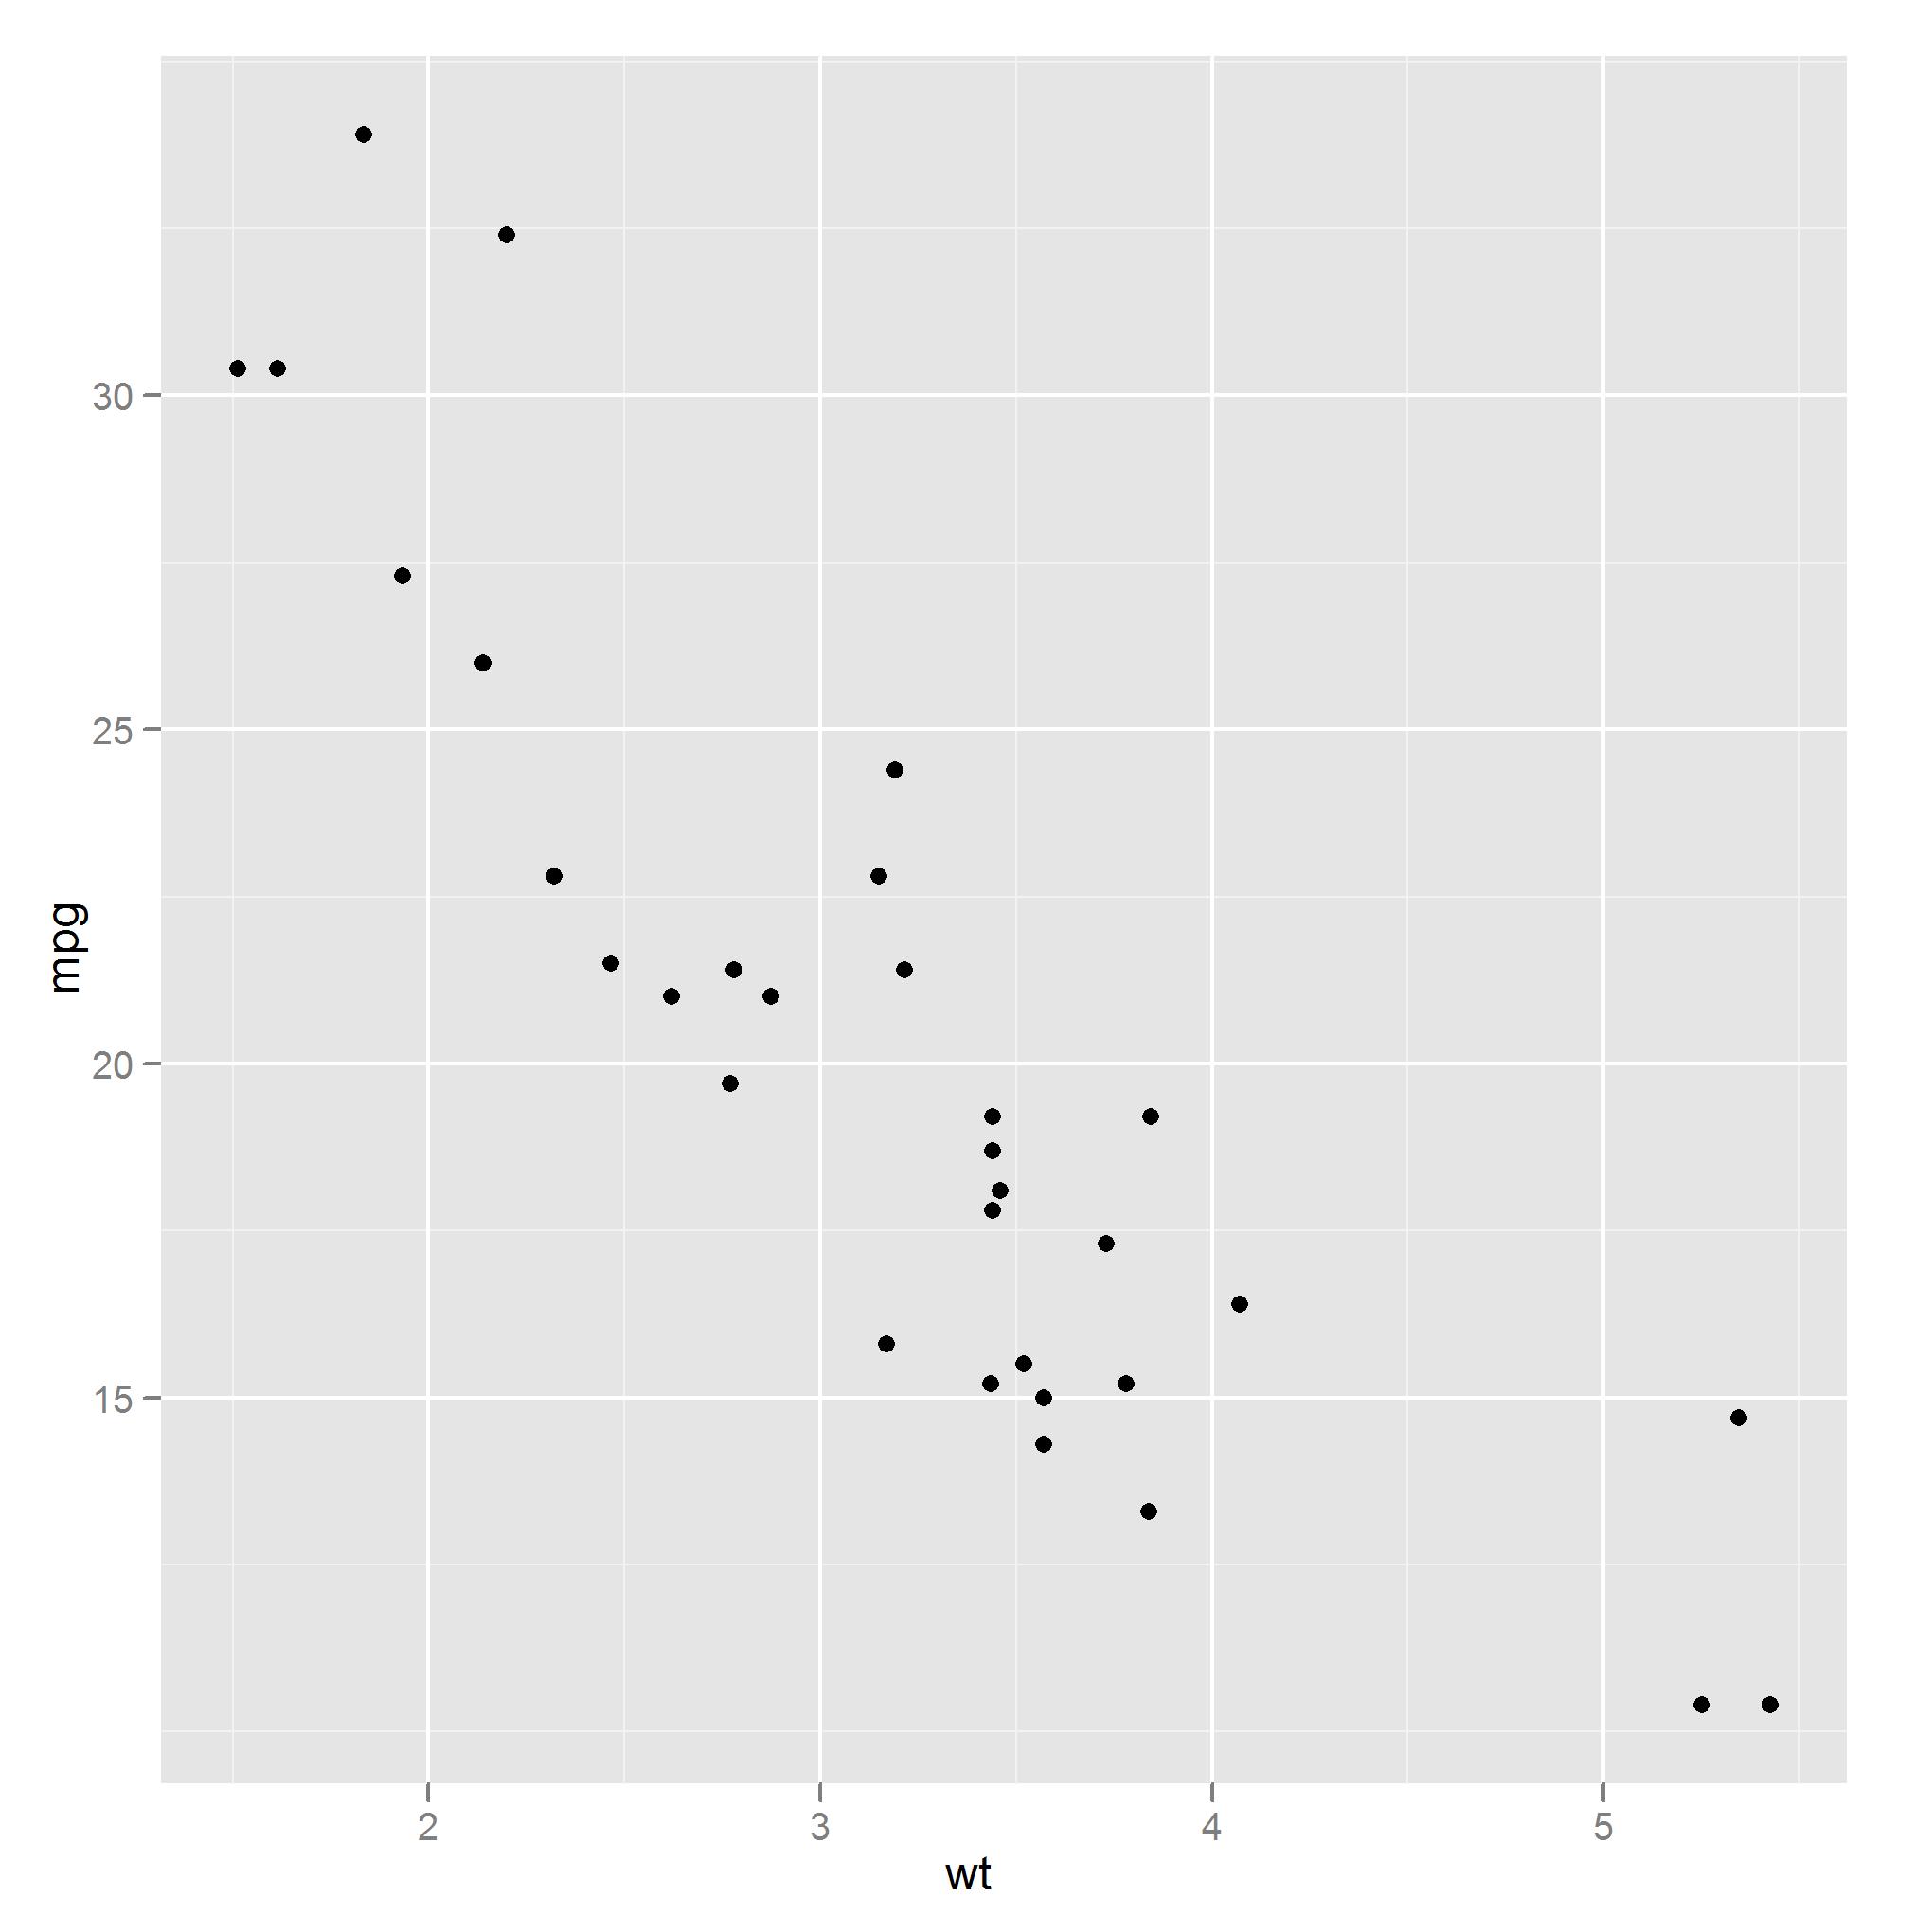 Adapting graphs for presentations